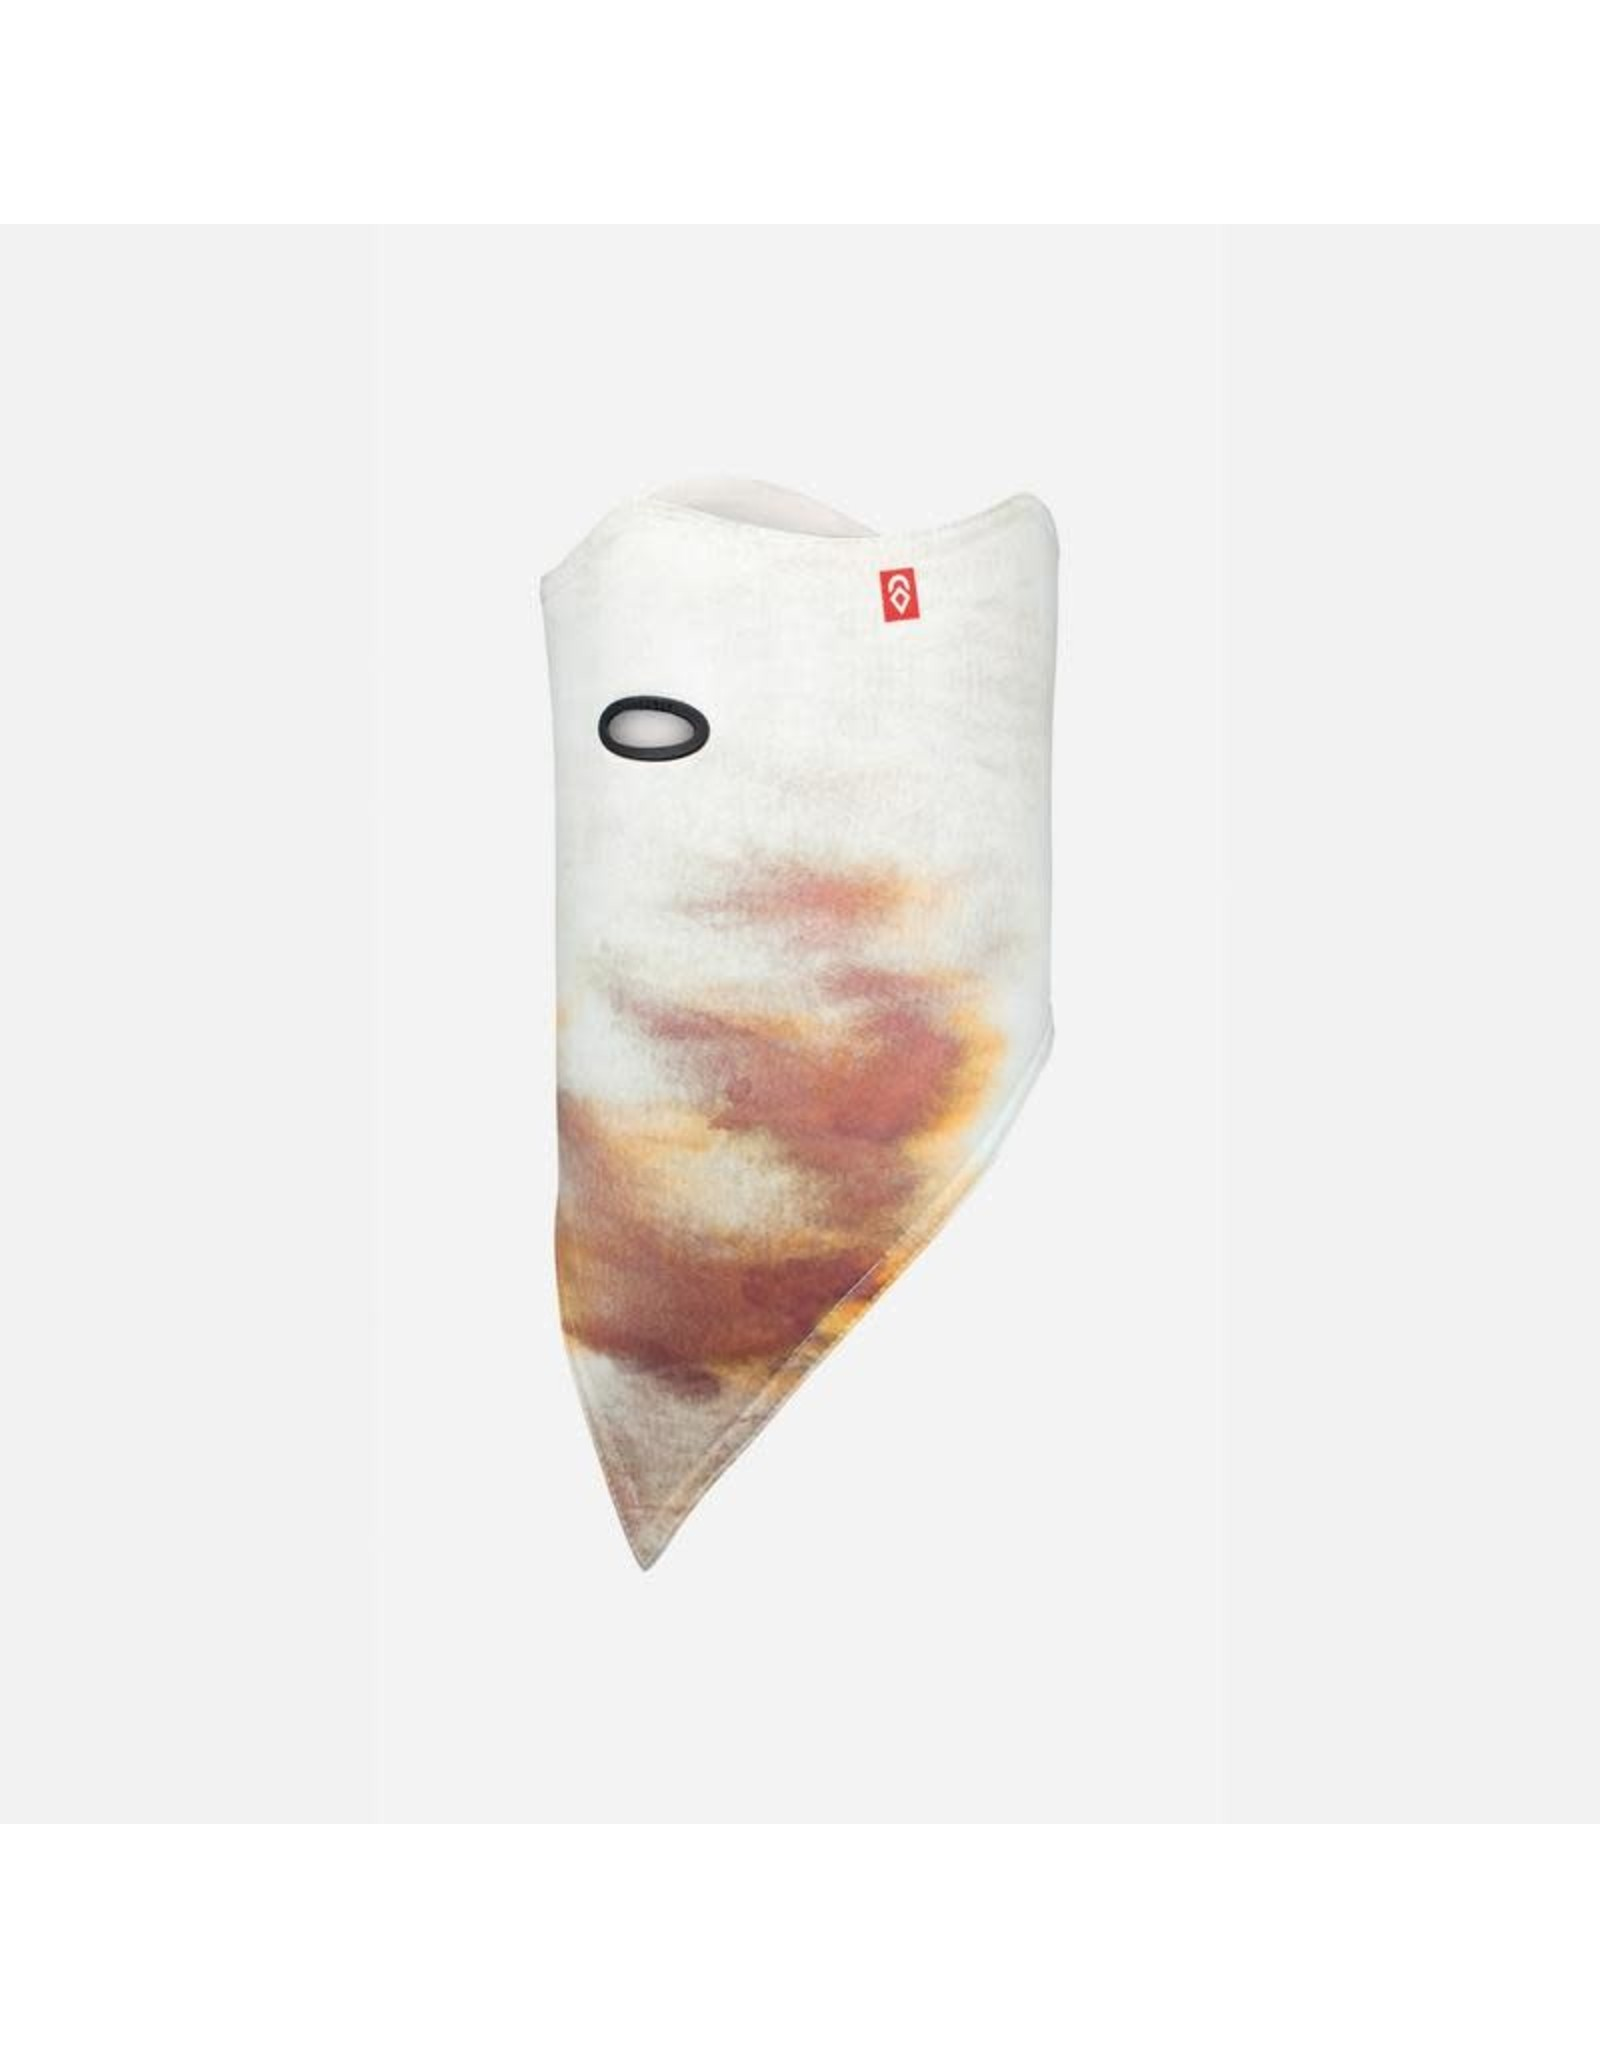 airhole Airhole - masque facemask autres